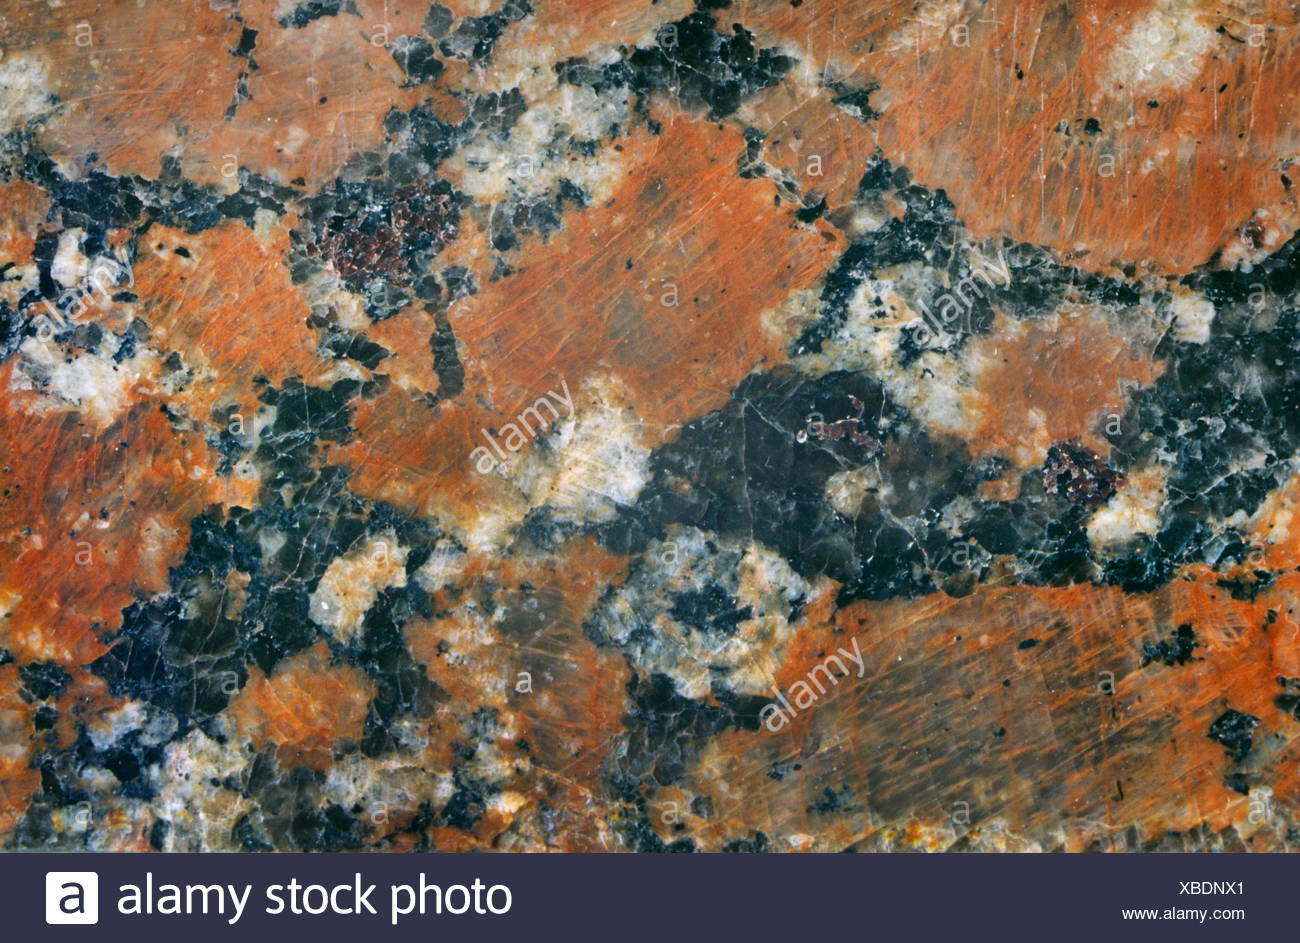 granite from Ukraine, Ukraine - Stock Image